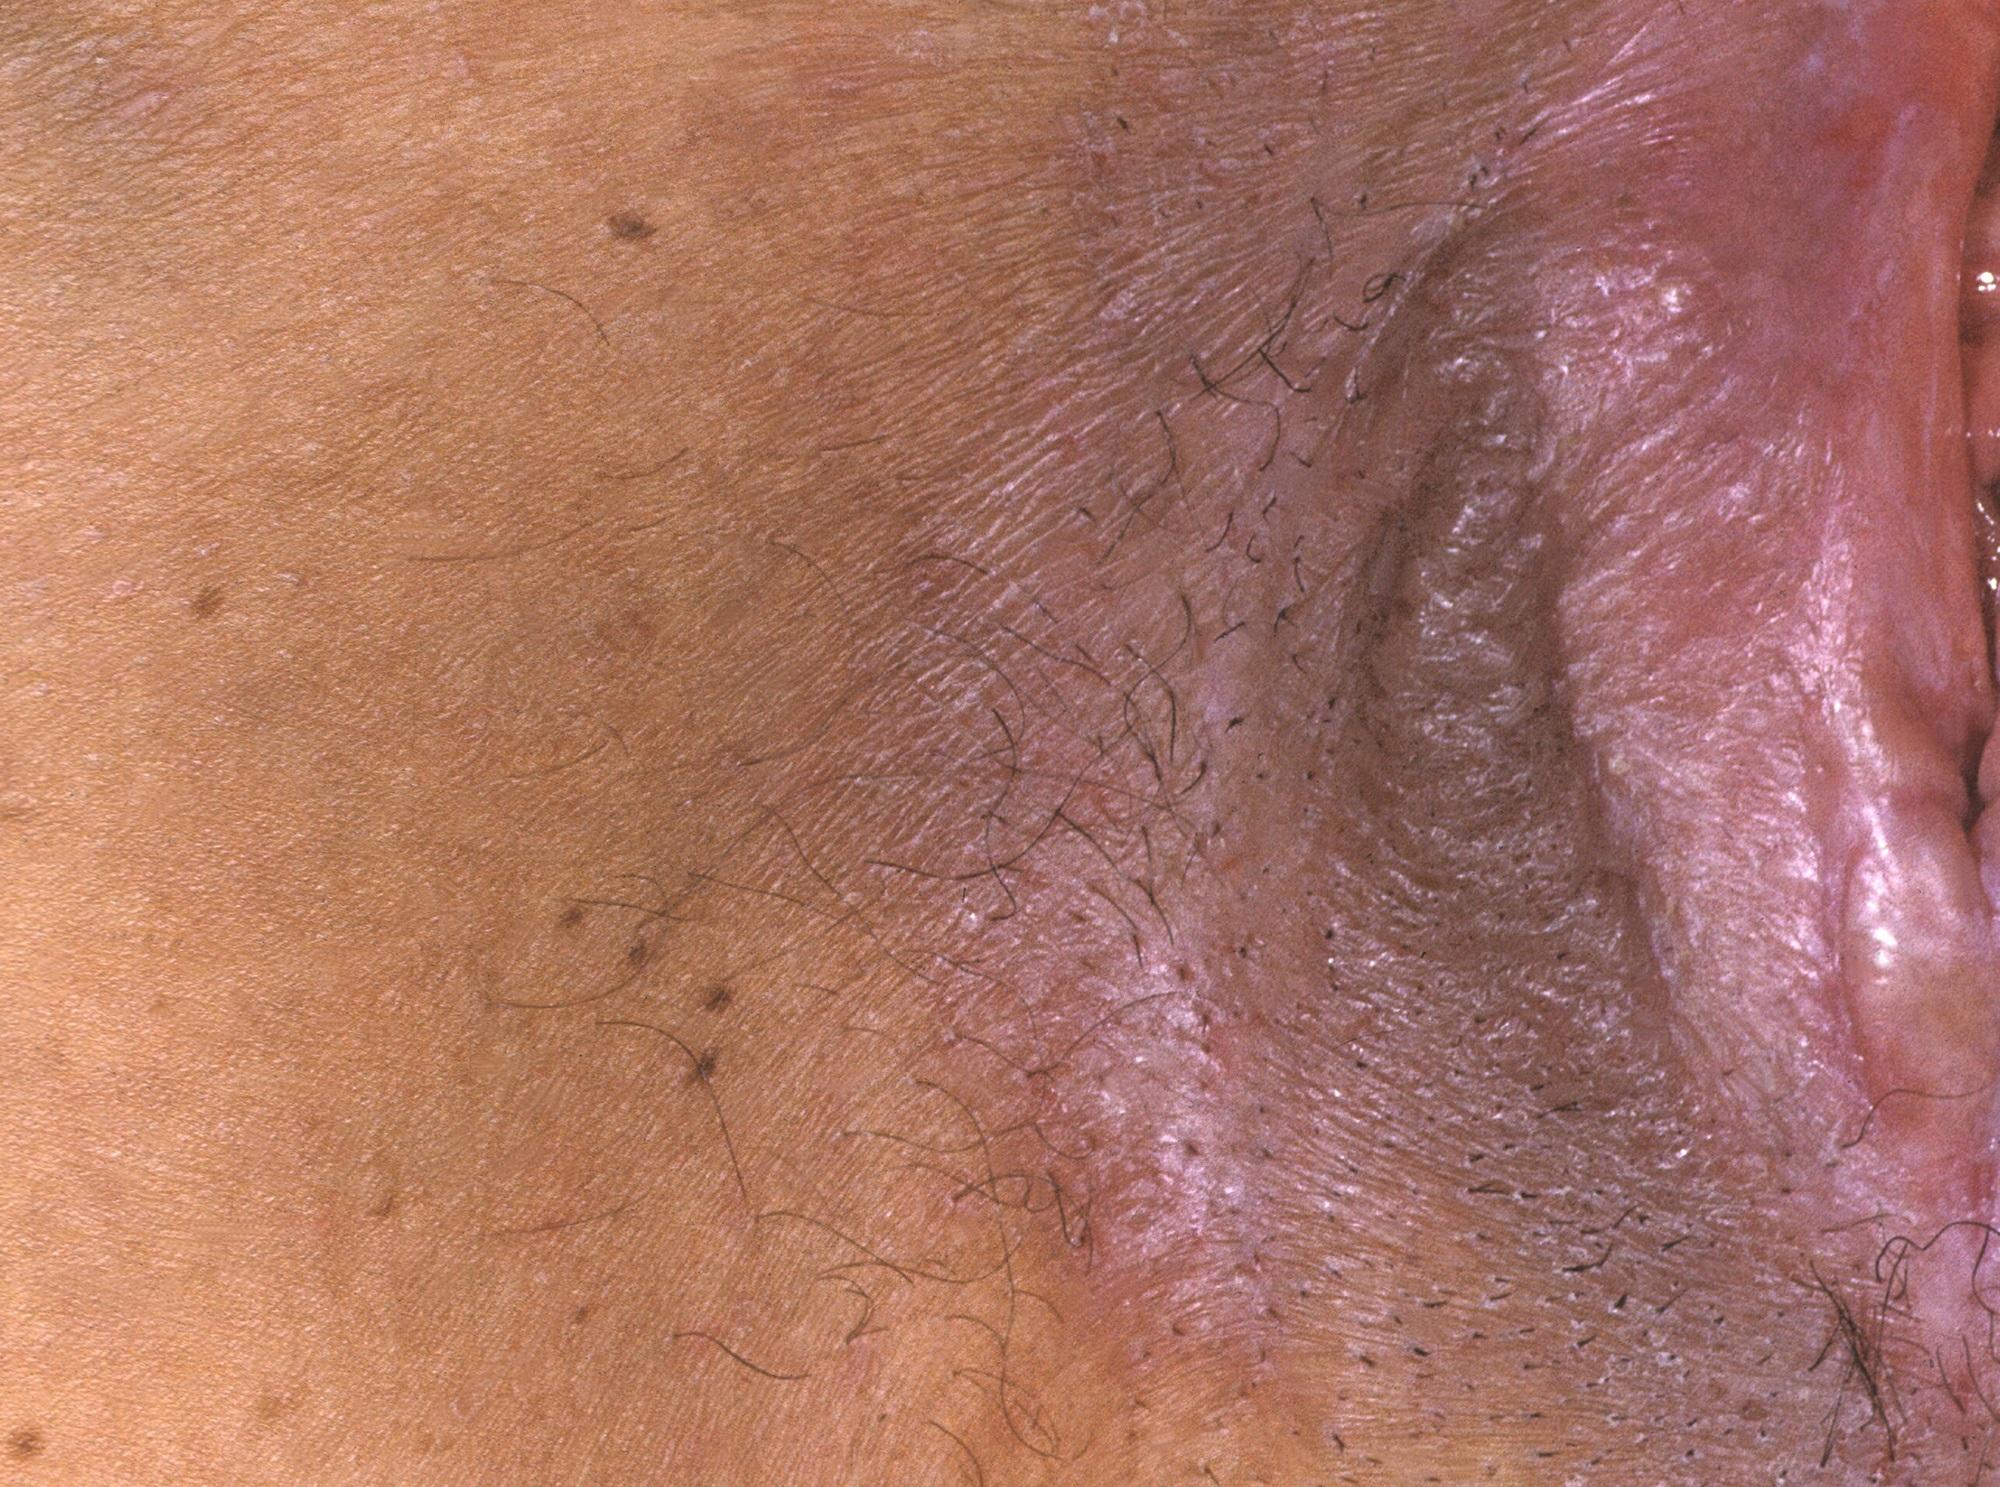 Emerging Treatments for Vulvar Lichen Sclerosus Offer